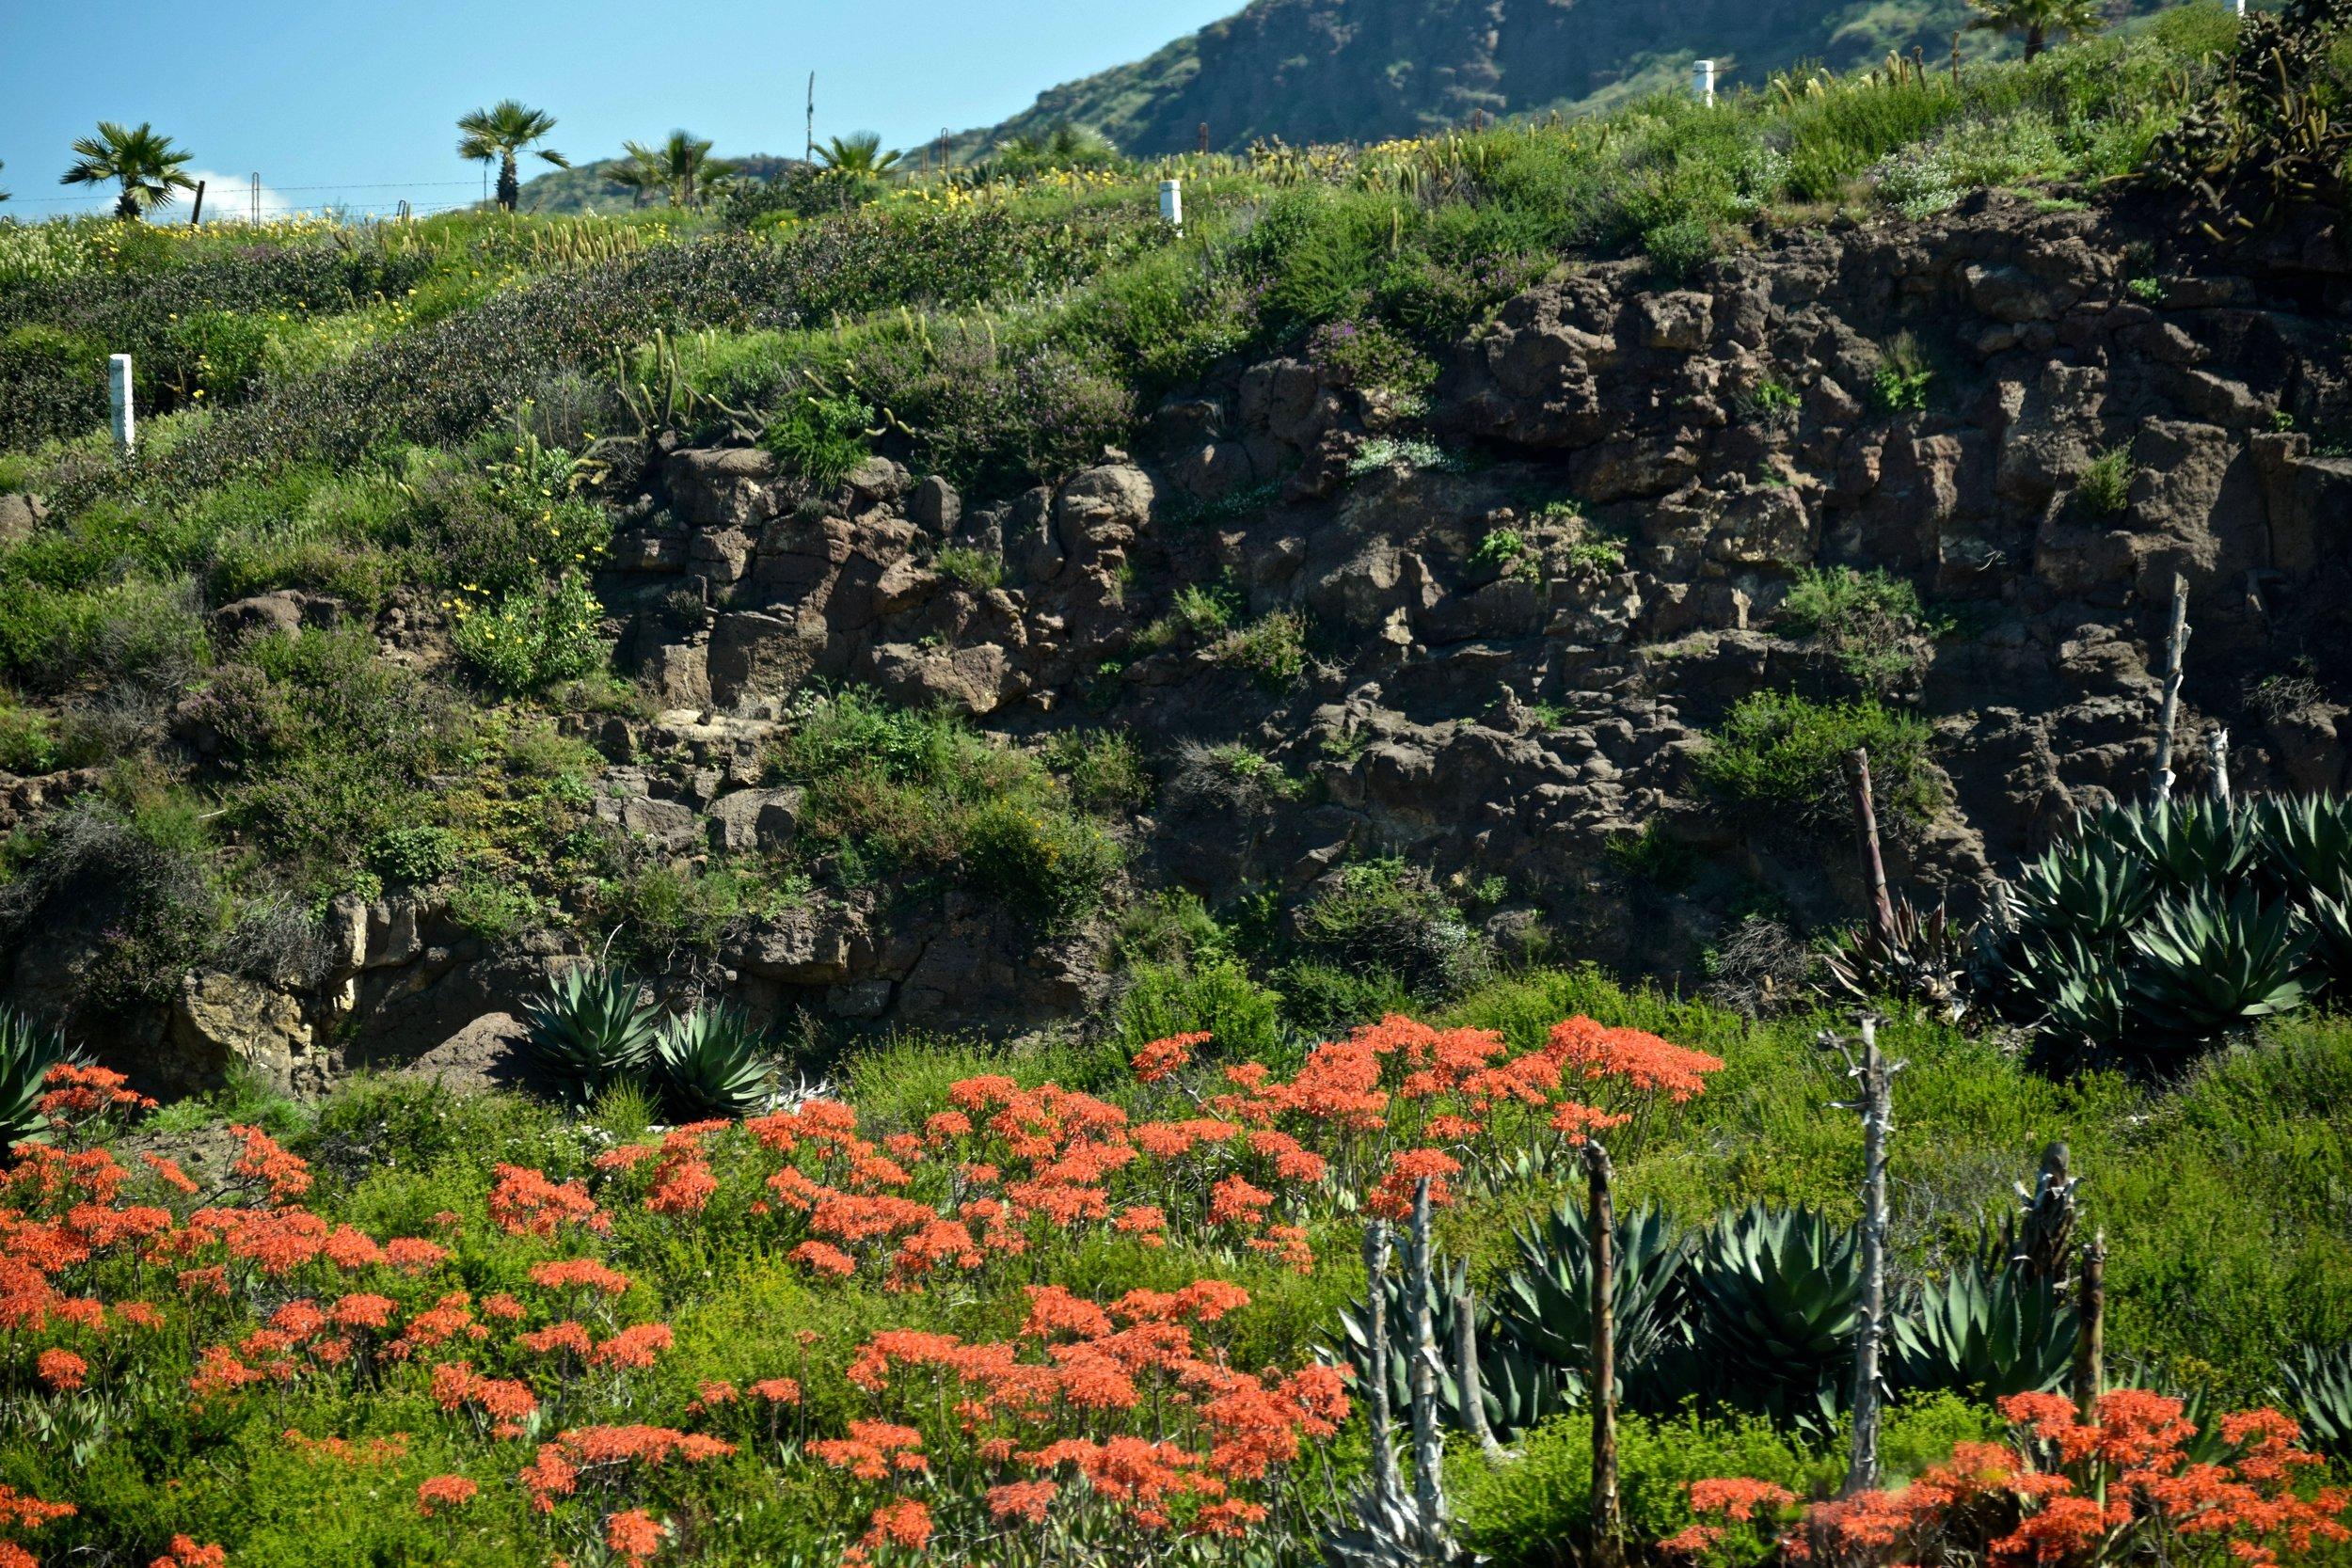 Lush hillside in El Valle de Guadalupe. Photo by Gabriel Manzo.